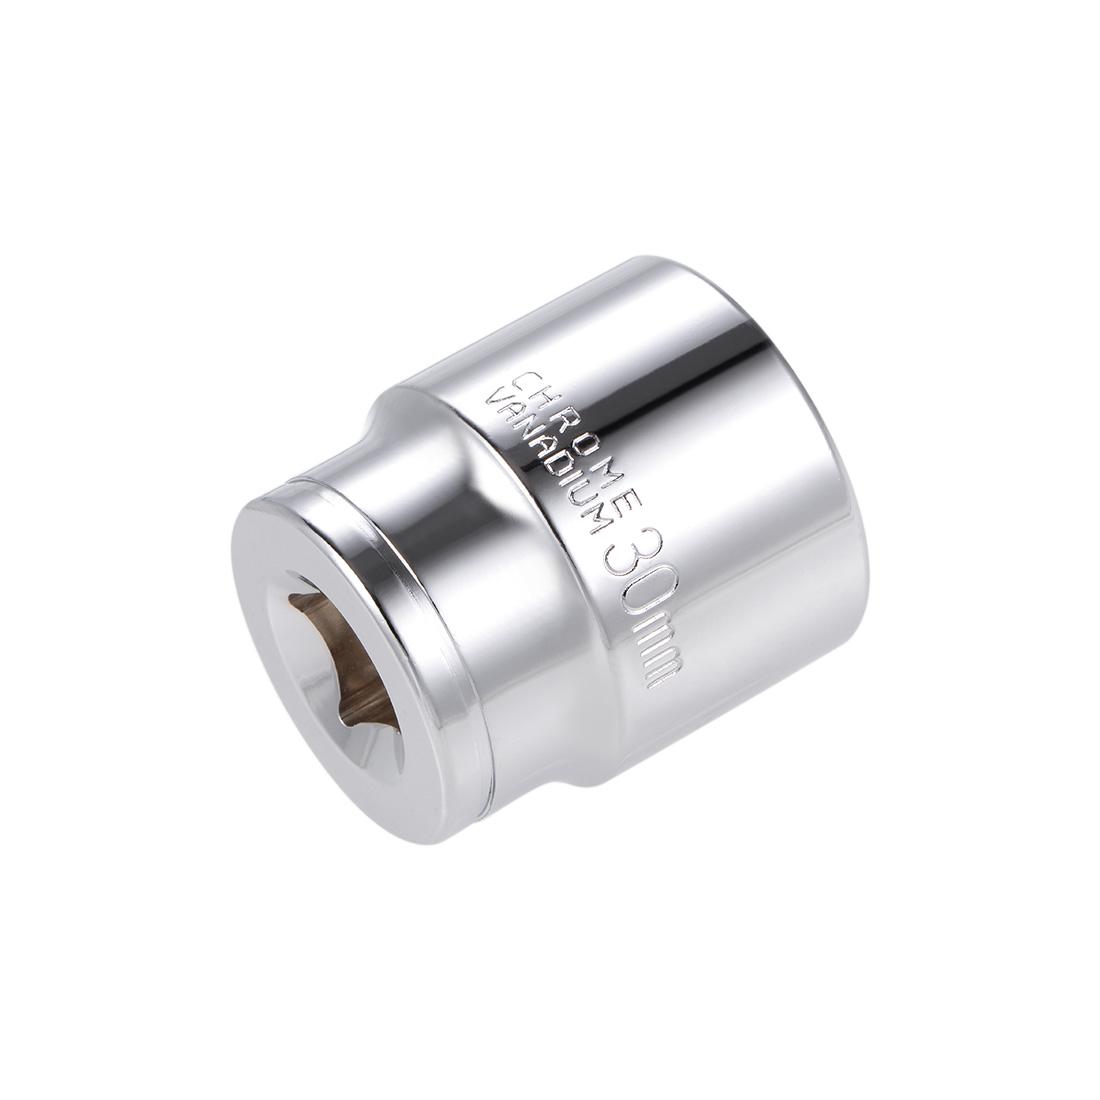 1/2-inch Drive E30 Universal Spline Socket Shallow 12 Point Cr-V Steel